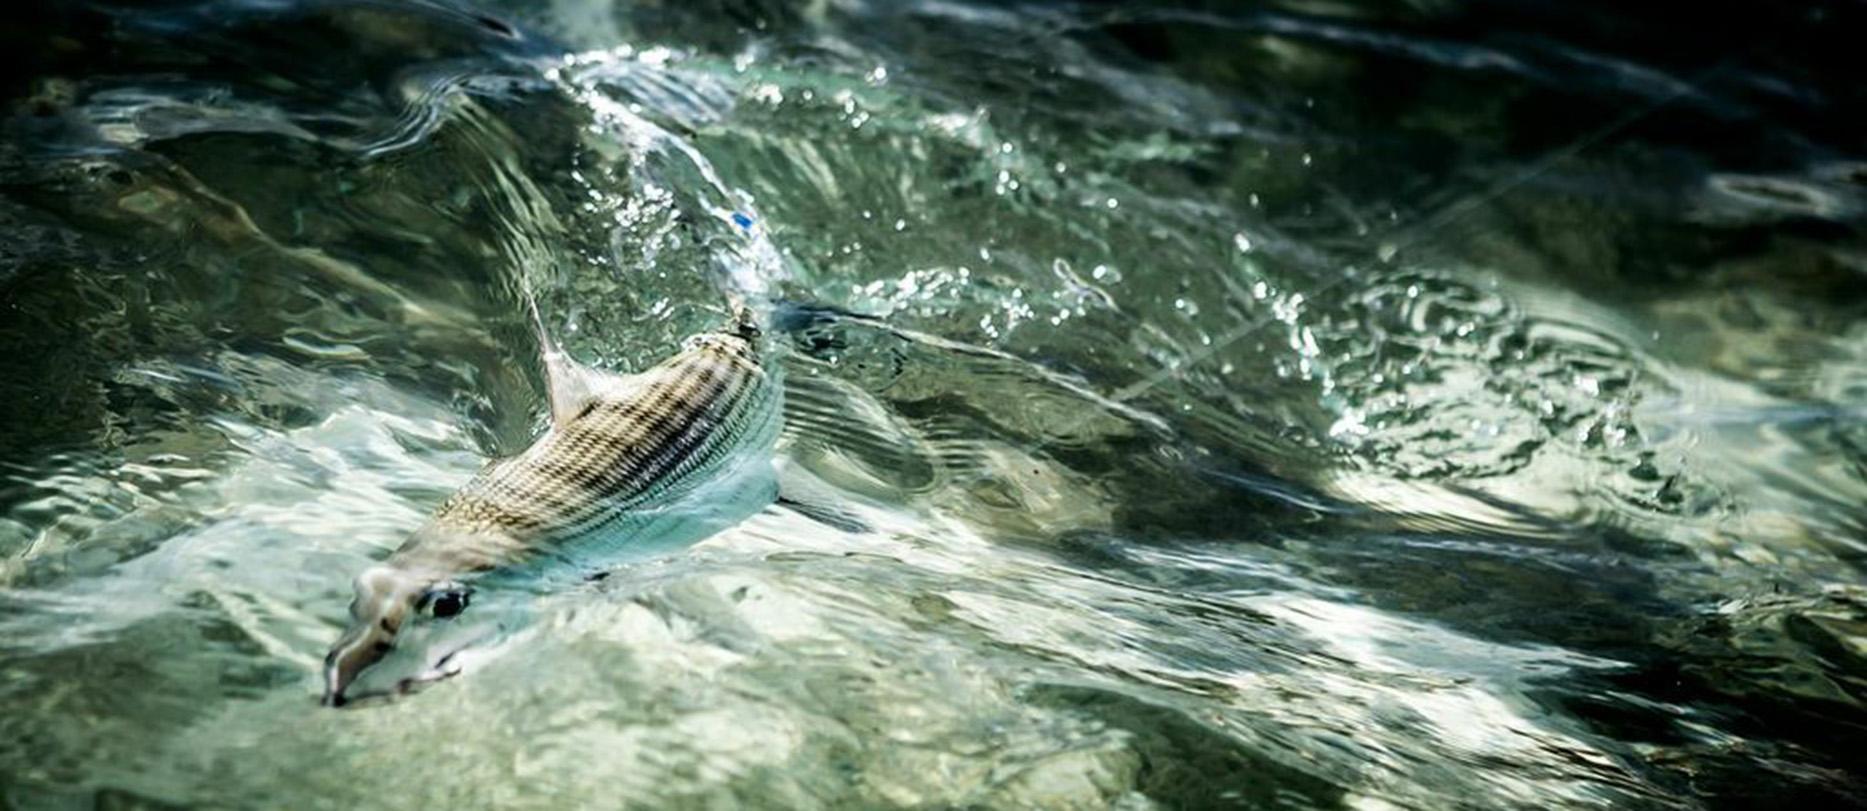 Travel Fishing Lodge Fly Fishing Bonefish Tarpon Salt Flats Permit Jacks Venezuela Los Roques Fly Fishing Trips